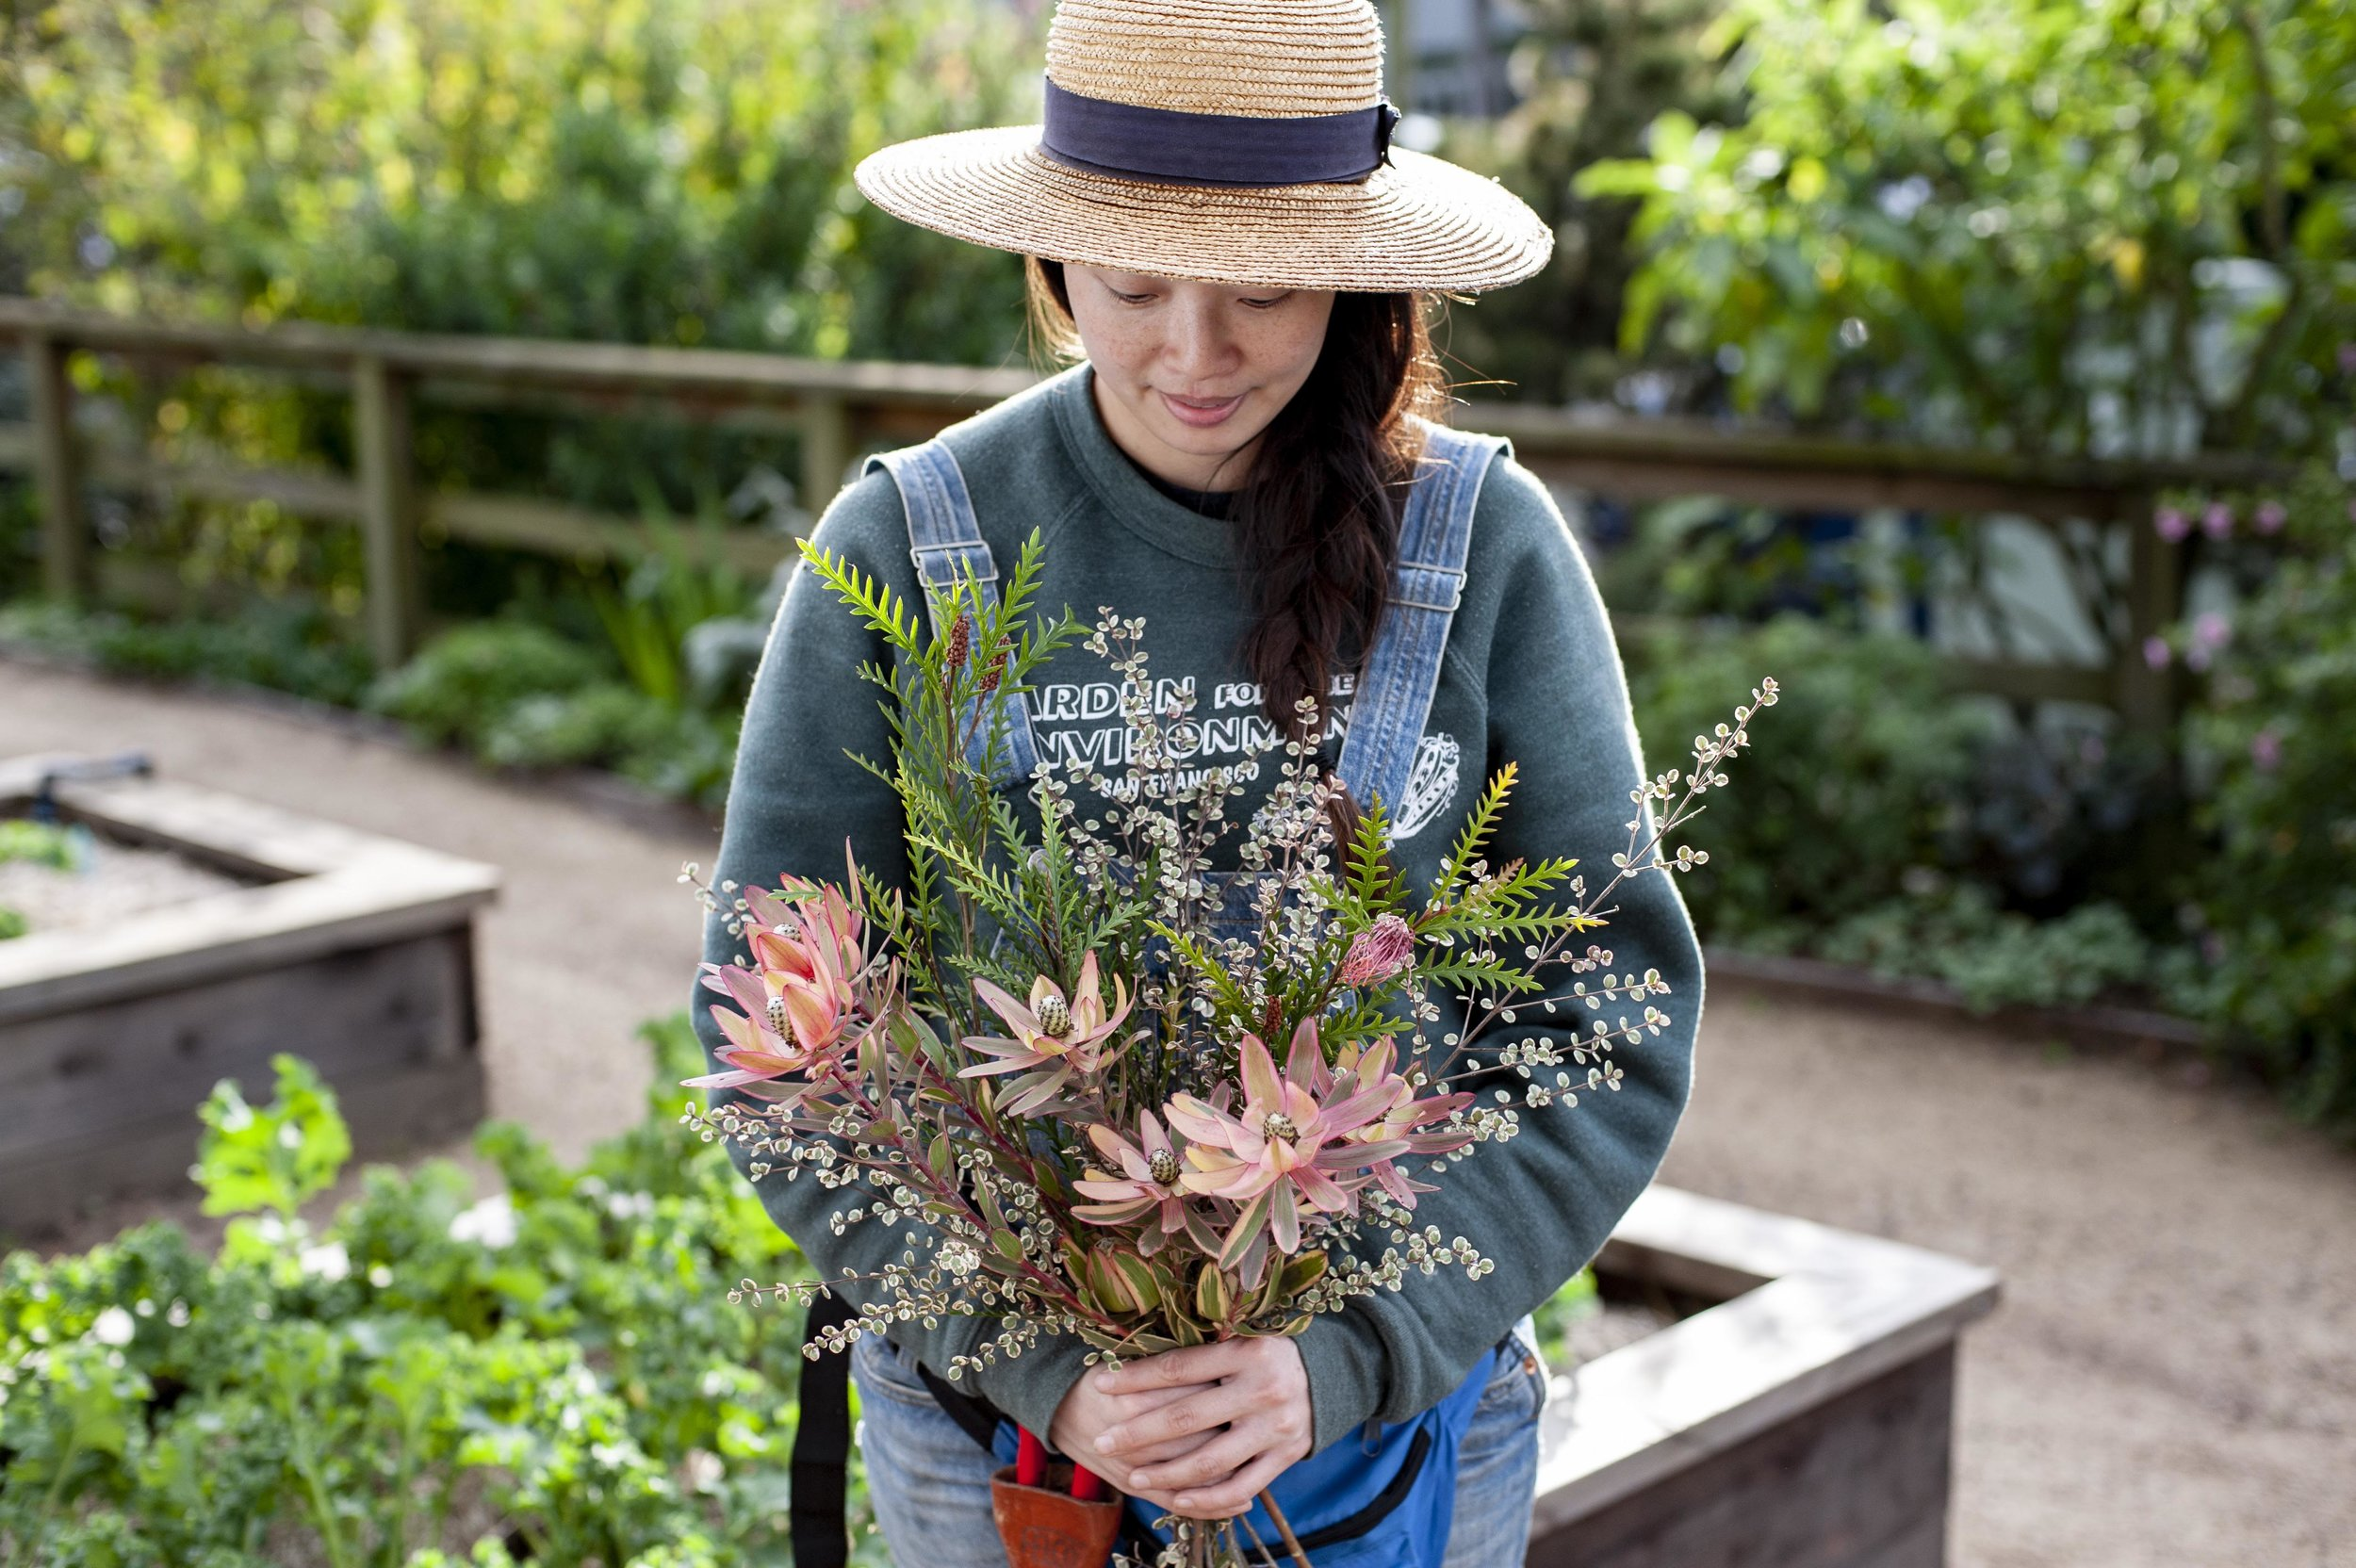 Volunteer extraordinaire Hana posing with a winter bouquet of  Leucadendron ,  Grevillea , and  Lophomyrtus .